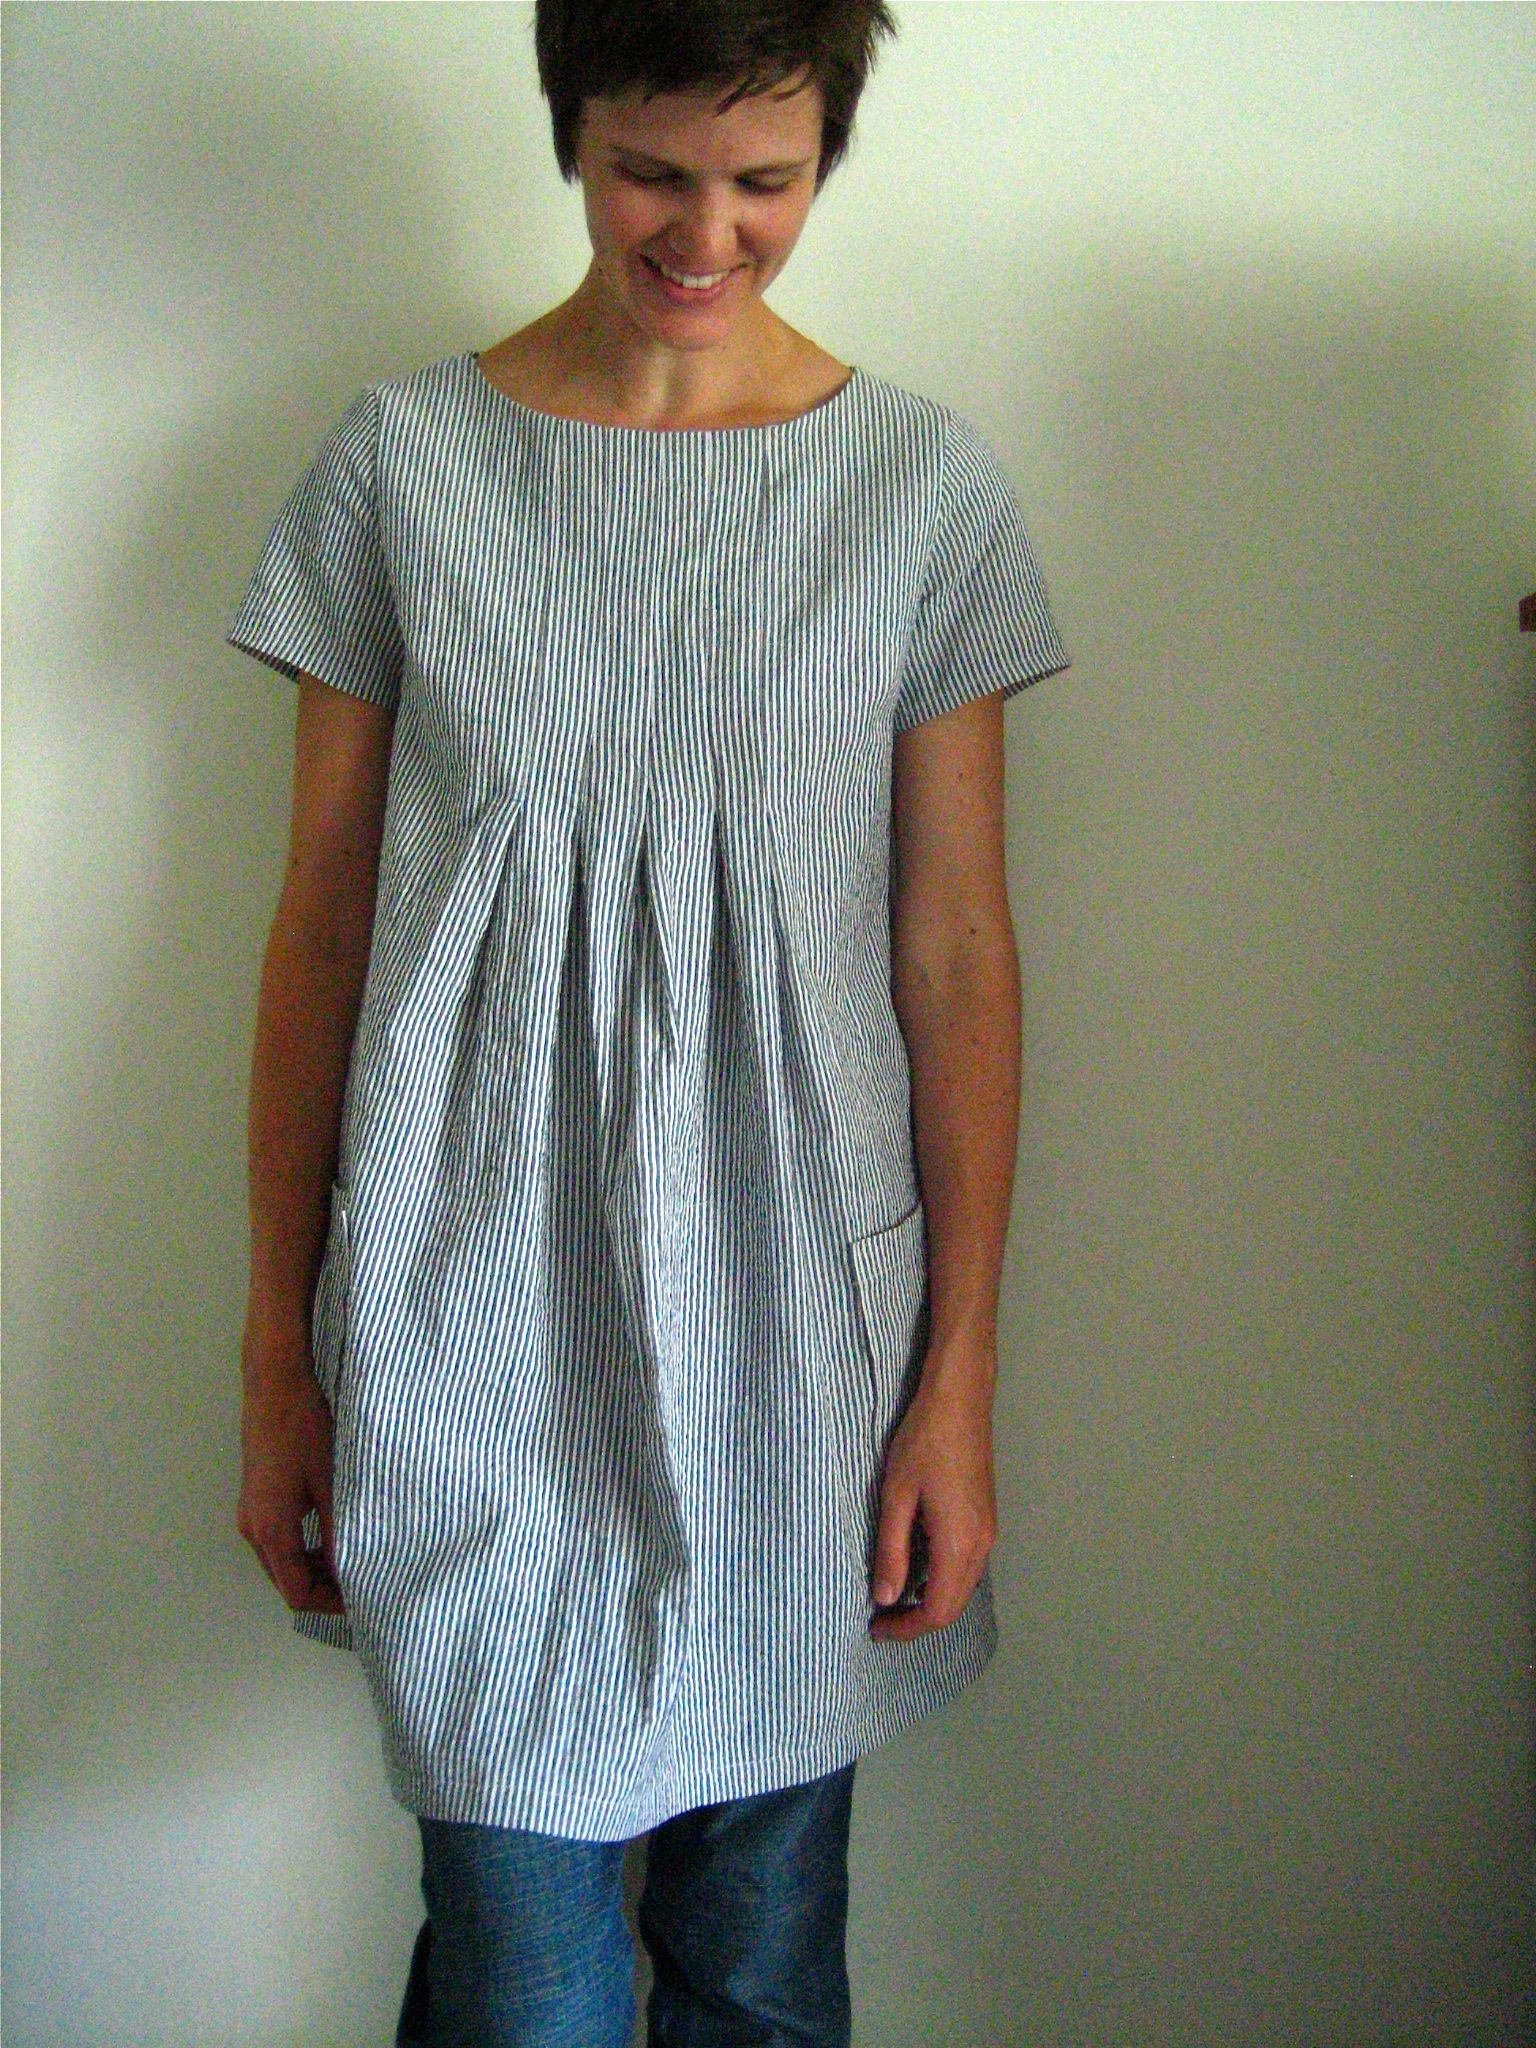 Stylish Dress Book Dress E Stylish Dress Book Book Dress Stylish Dresses